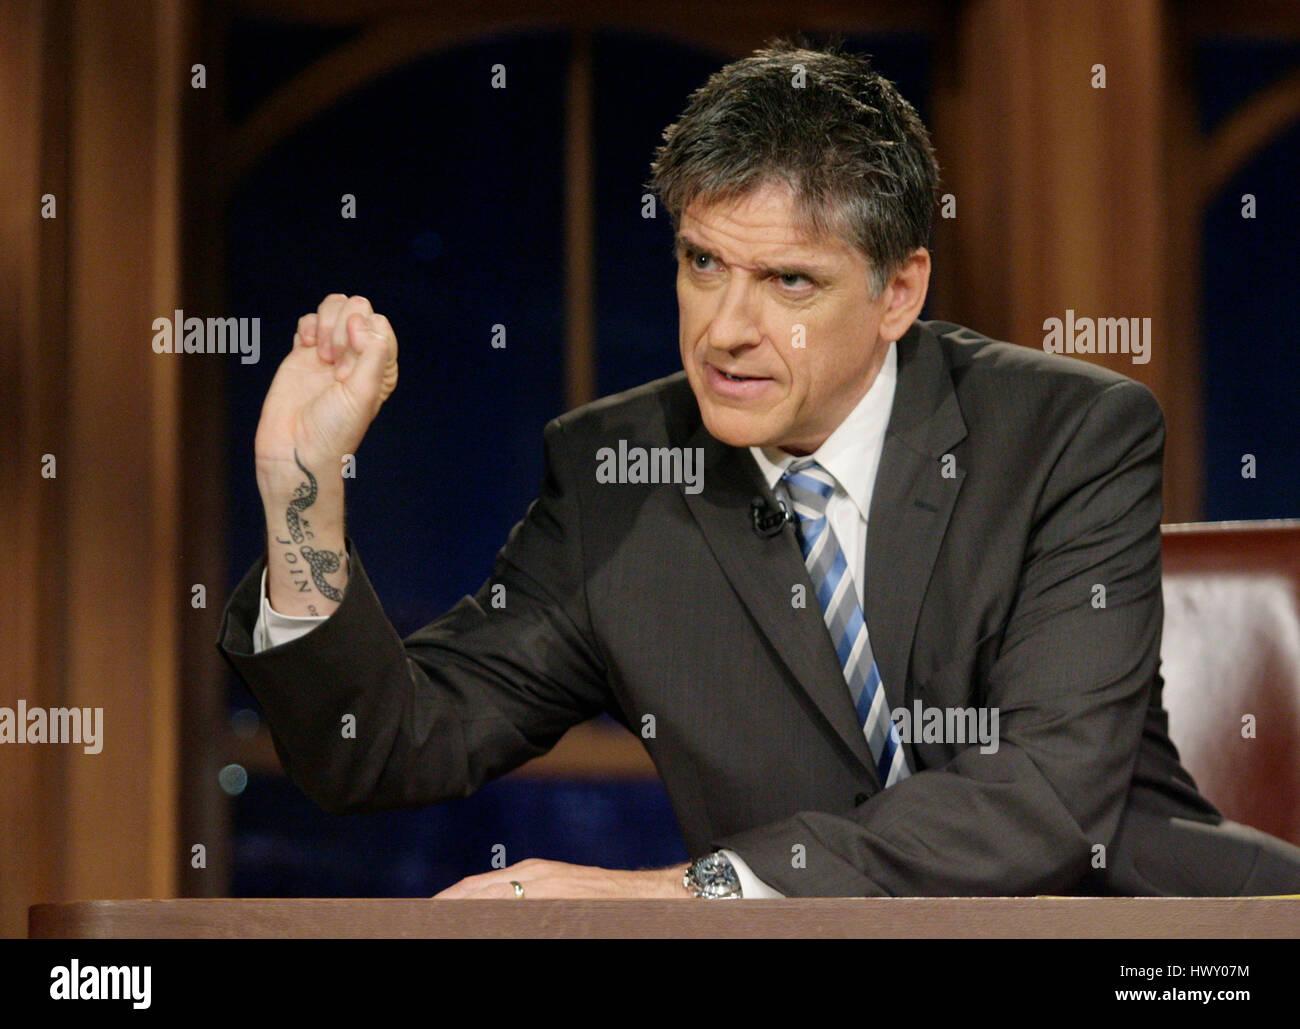 Host Craig Ferguson Shows Off His Tattoo During A Segment Of